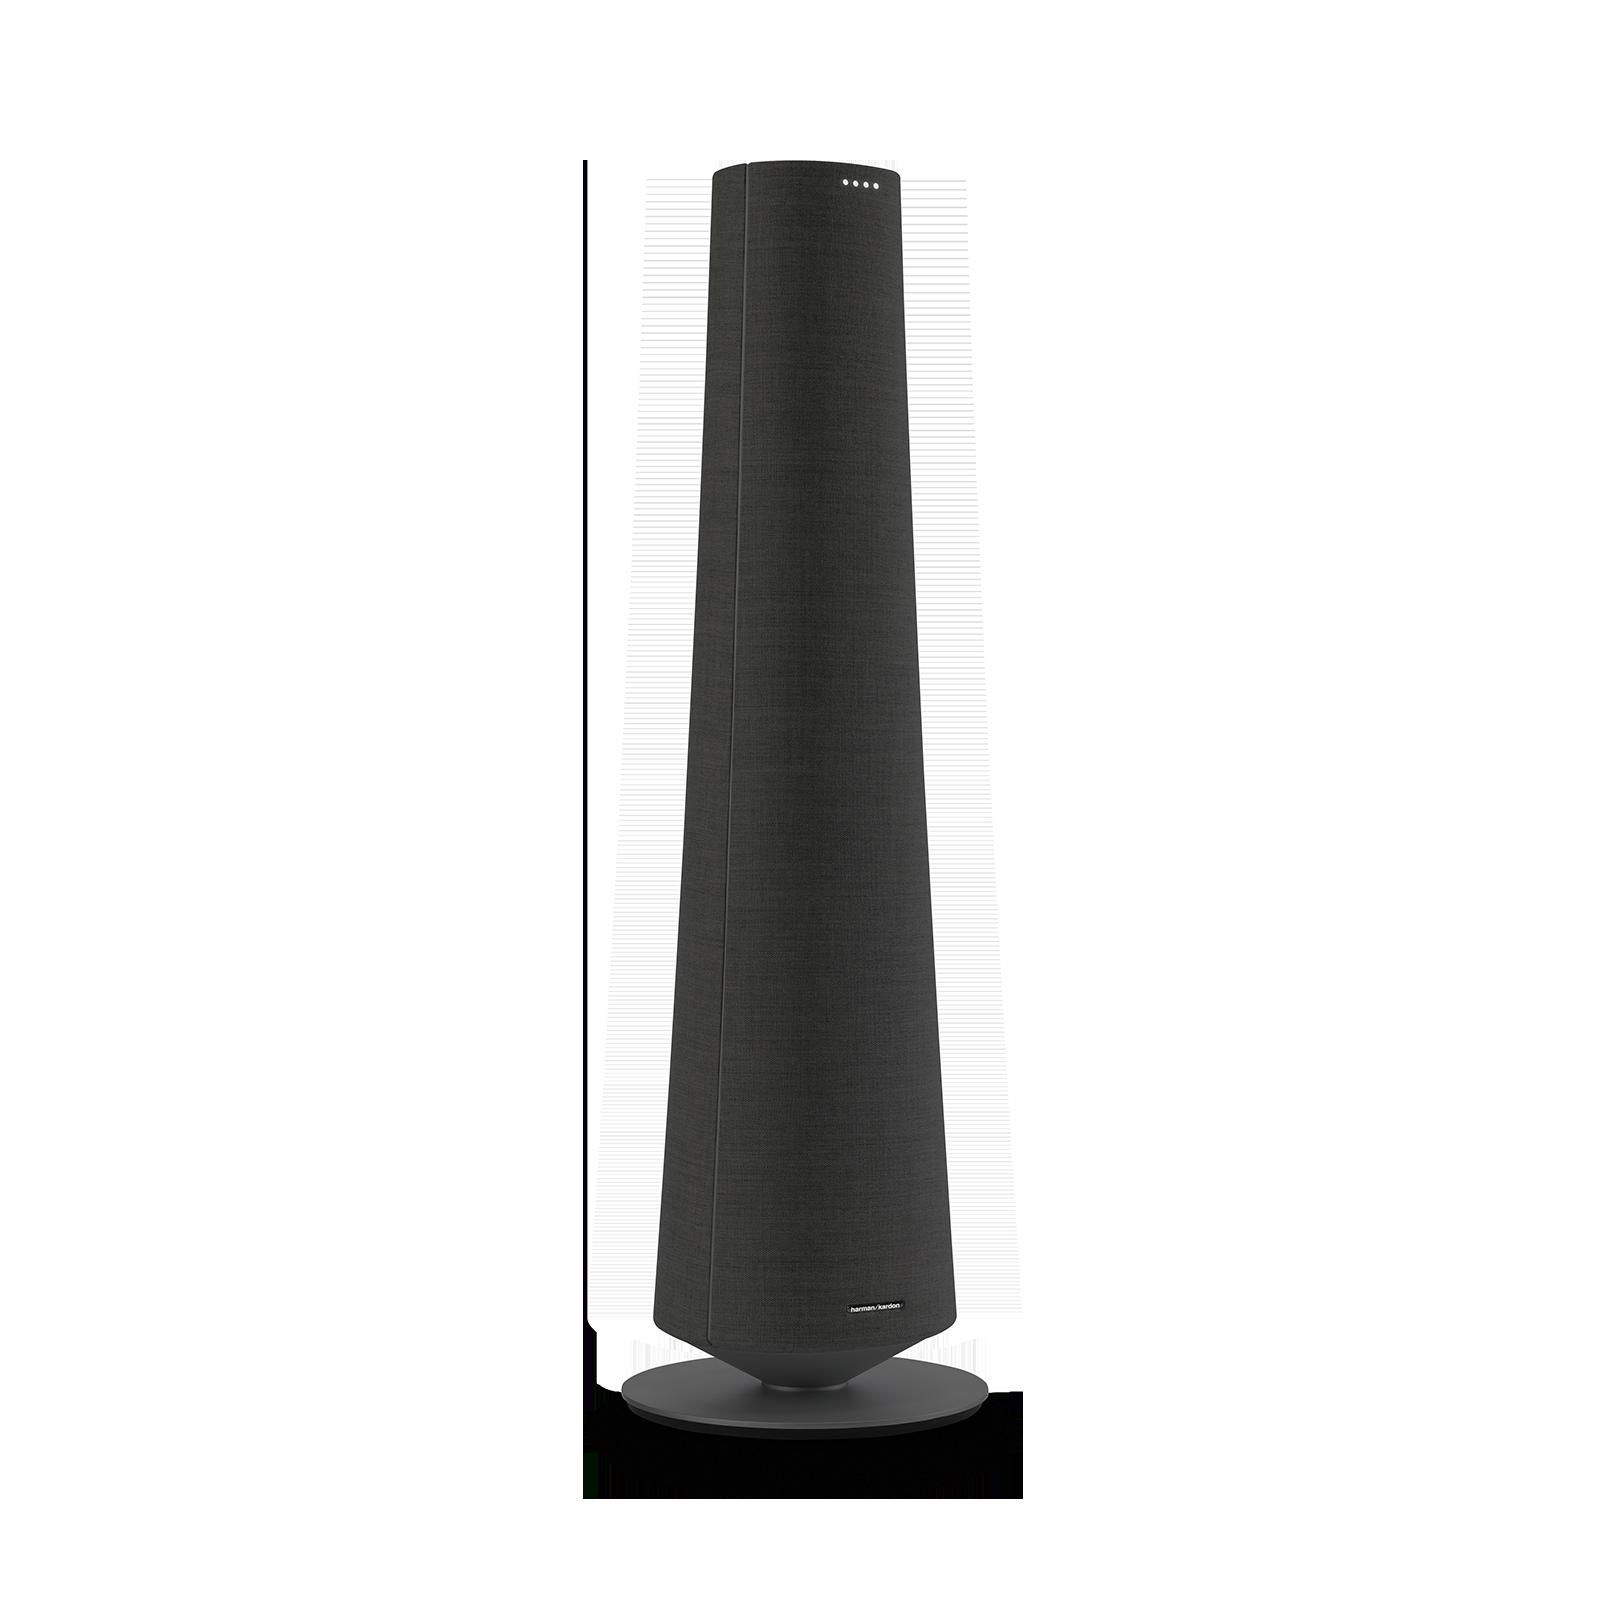 Harman Kardon Citation Tower - Black - Smart Premium Floorstanding Speaker that delivers an impactful performance - Detailshot 2